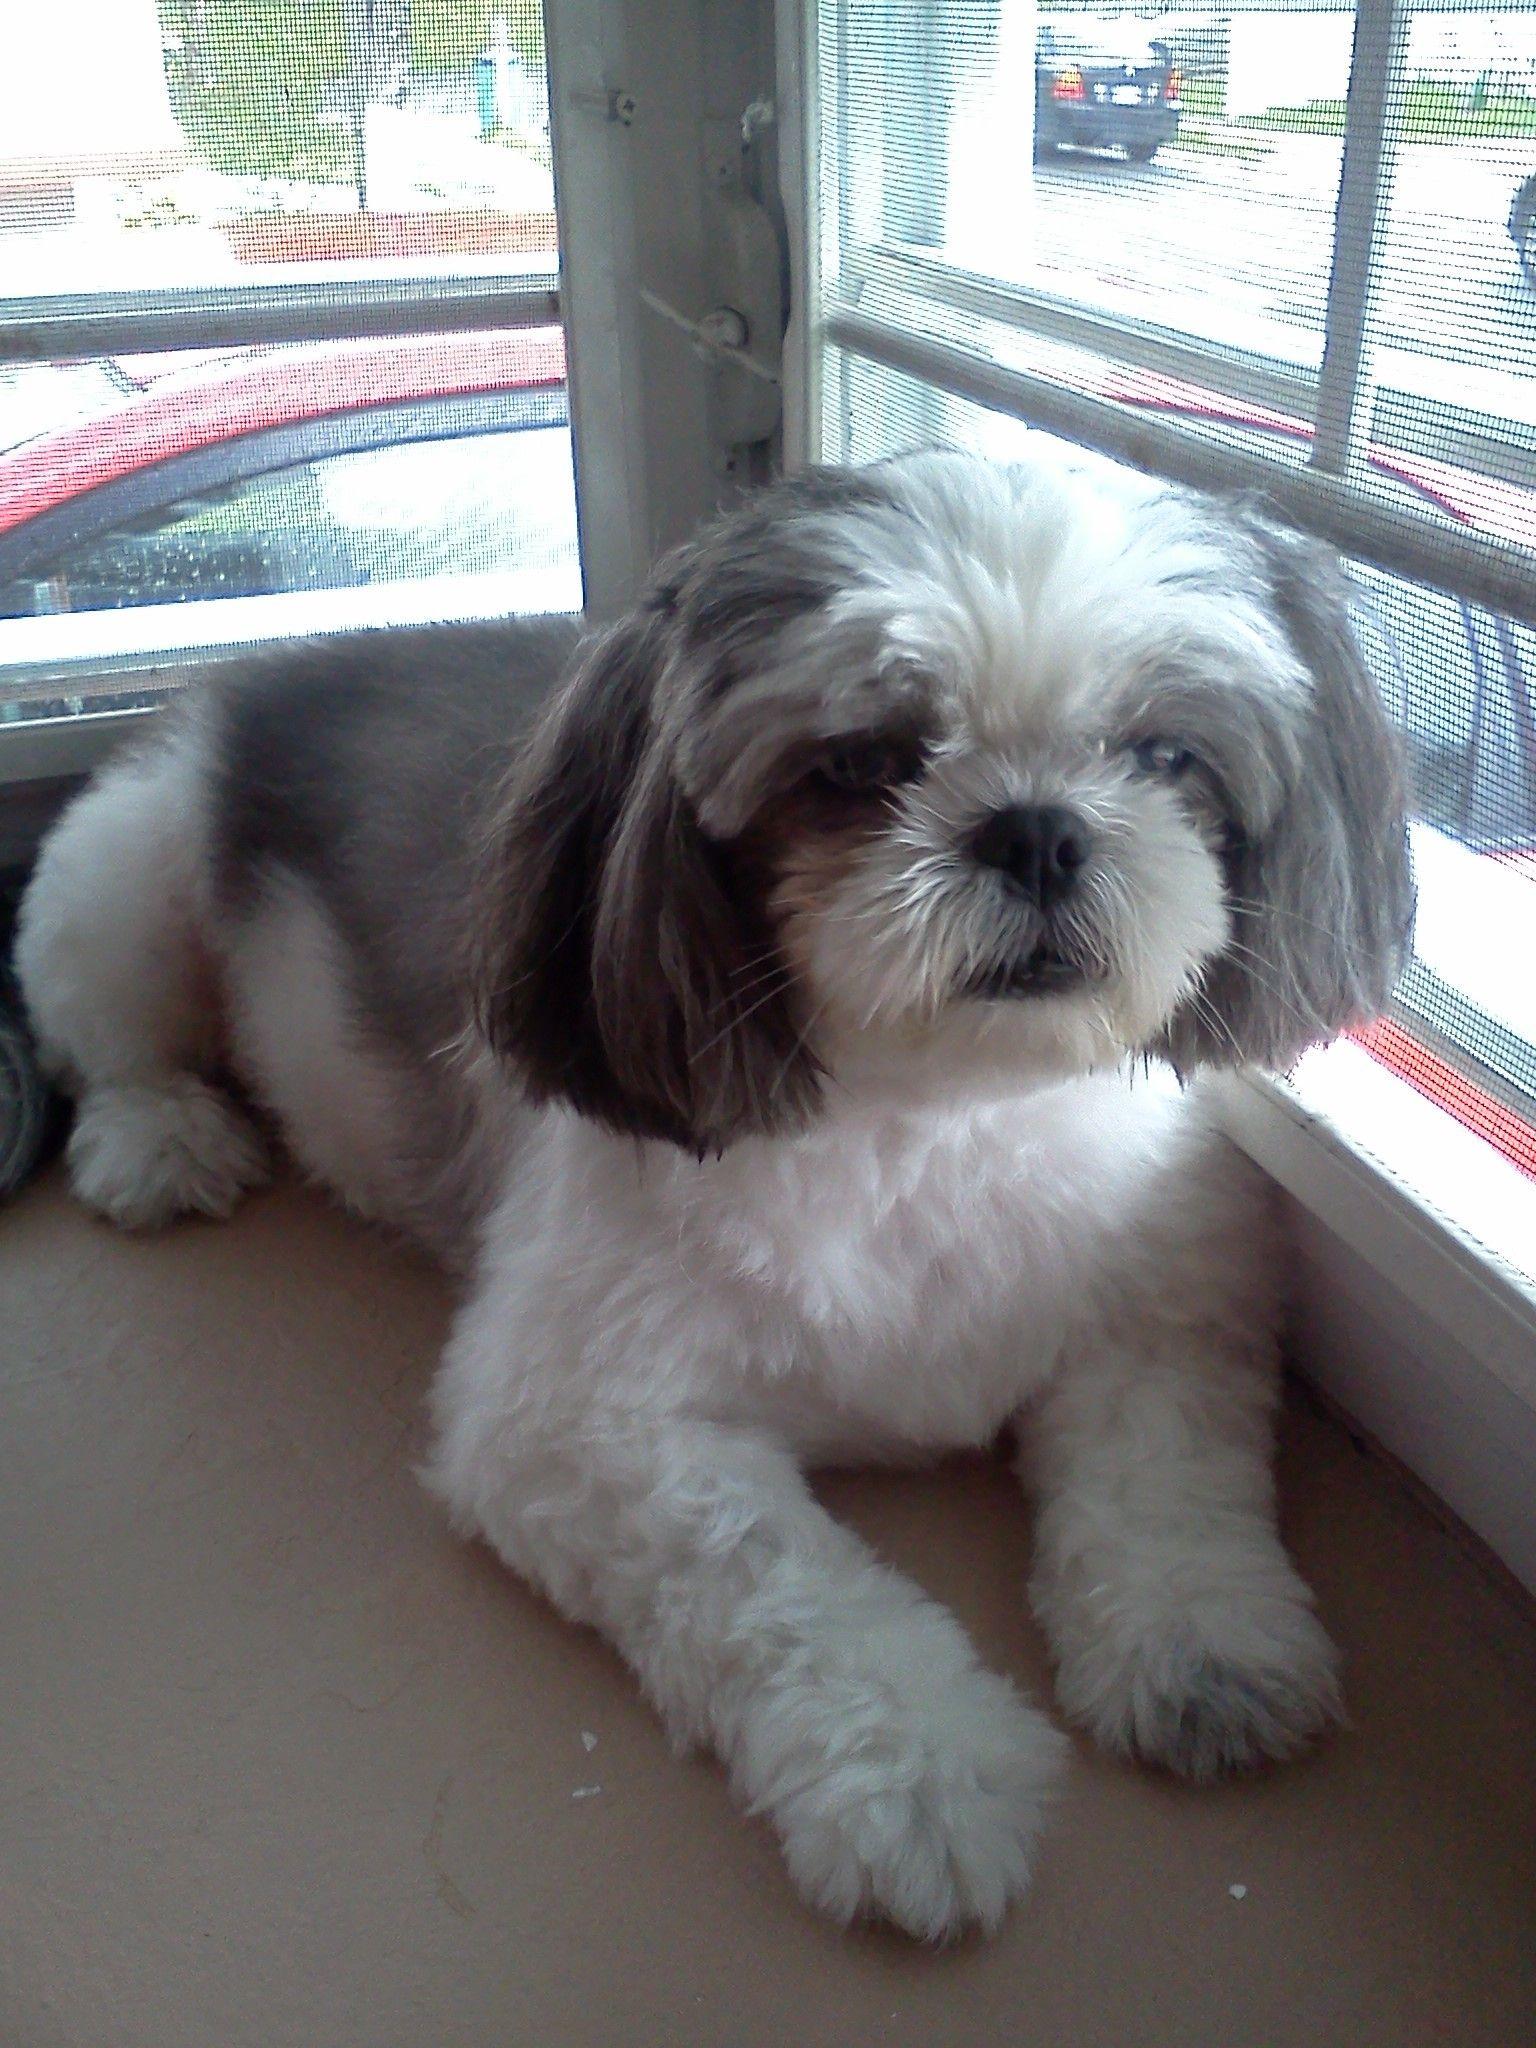 Shihtzu Dogs With Interesting Short Clip Shih Tzu Shih Tzu Dog Shih Tzu Puppy